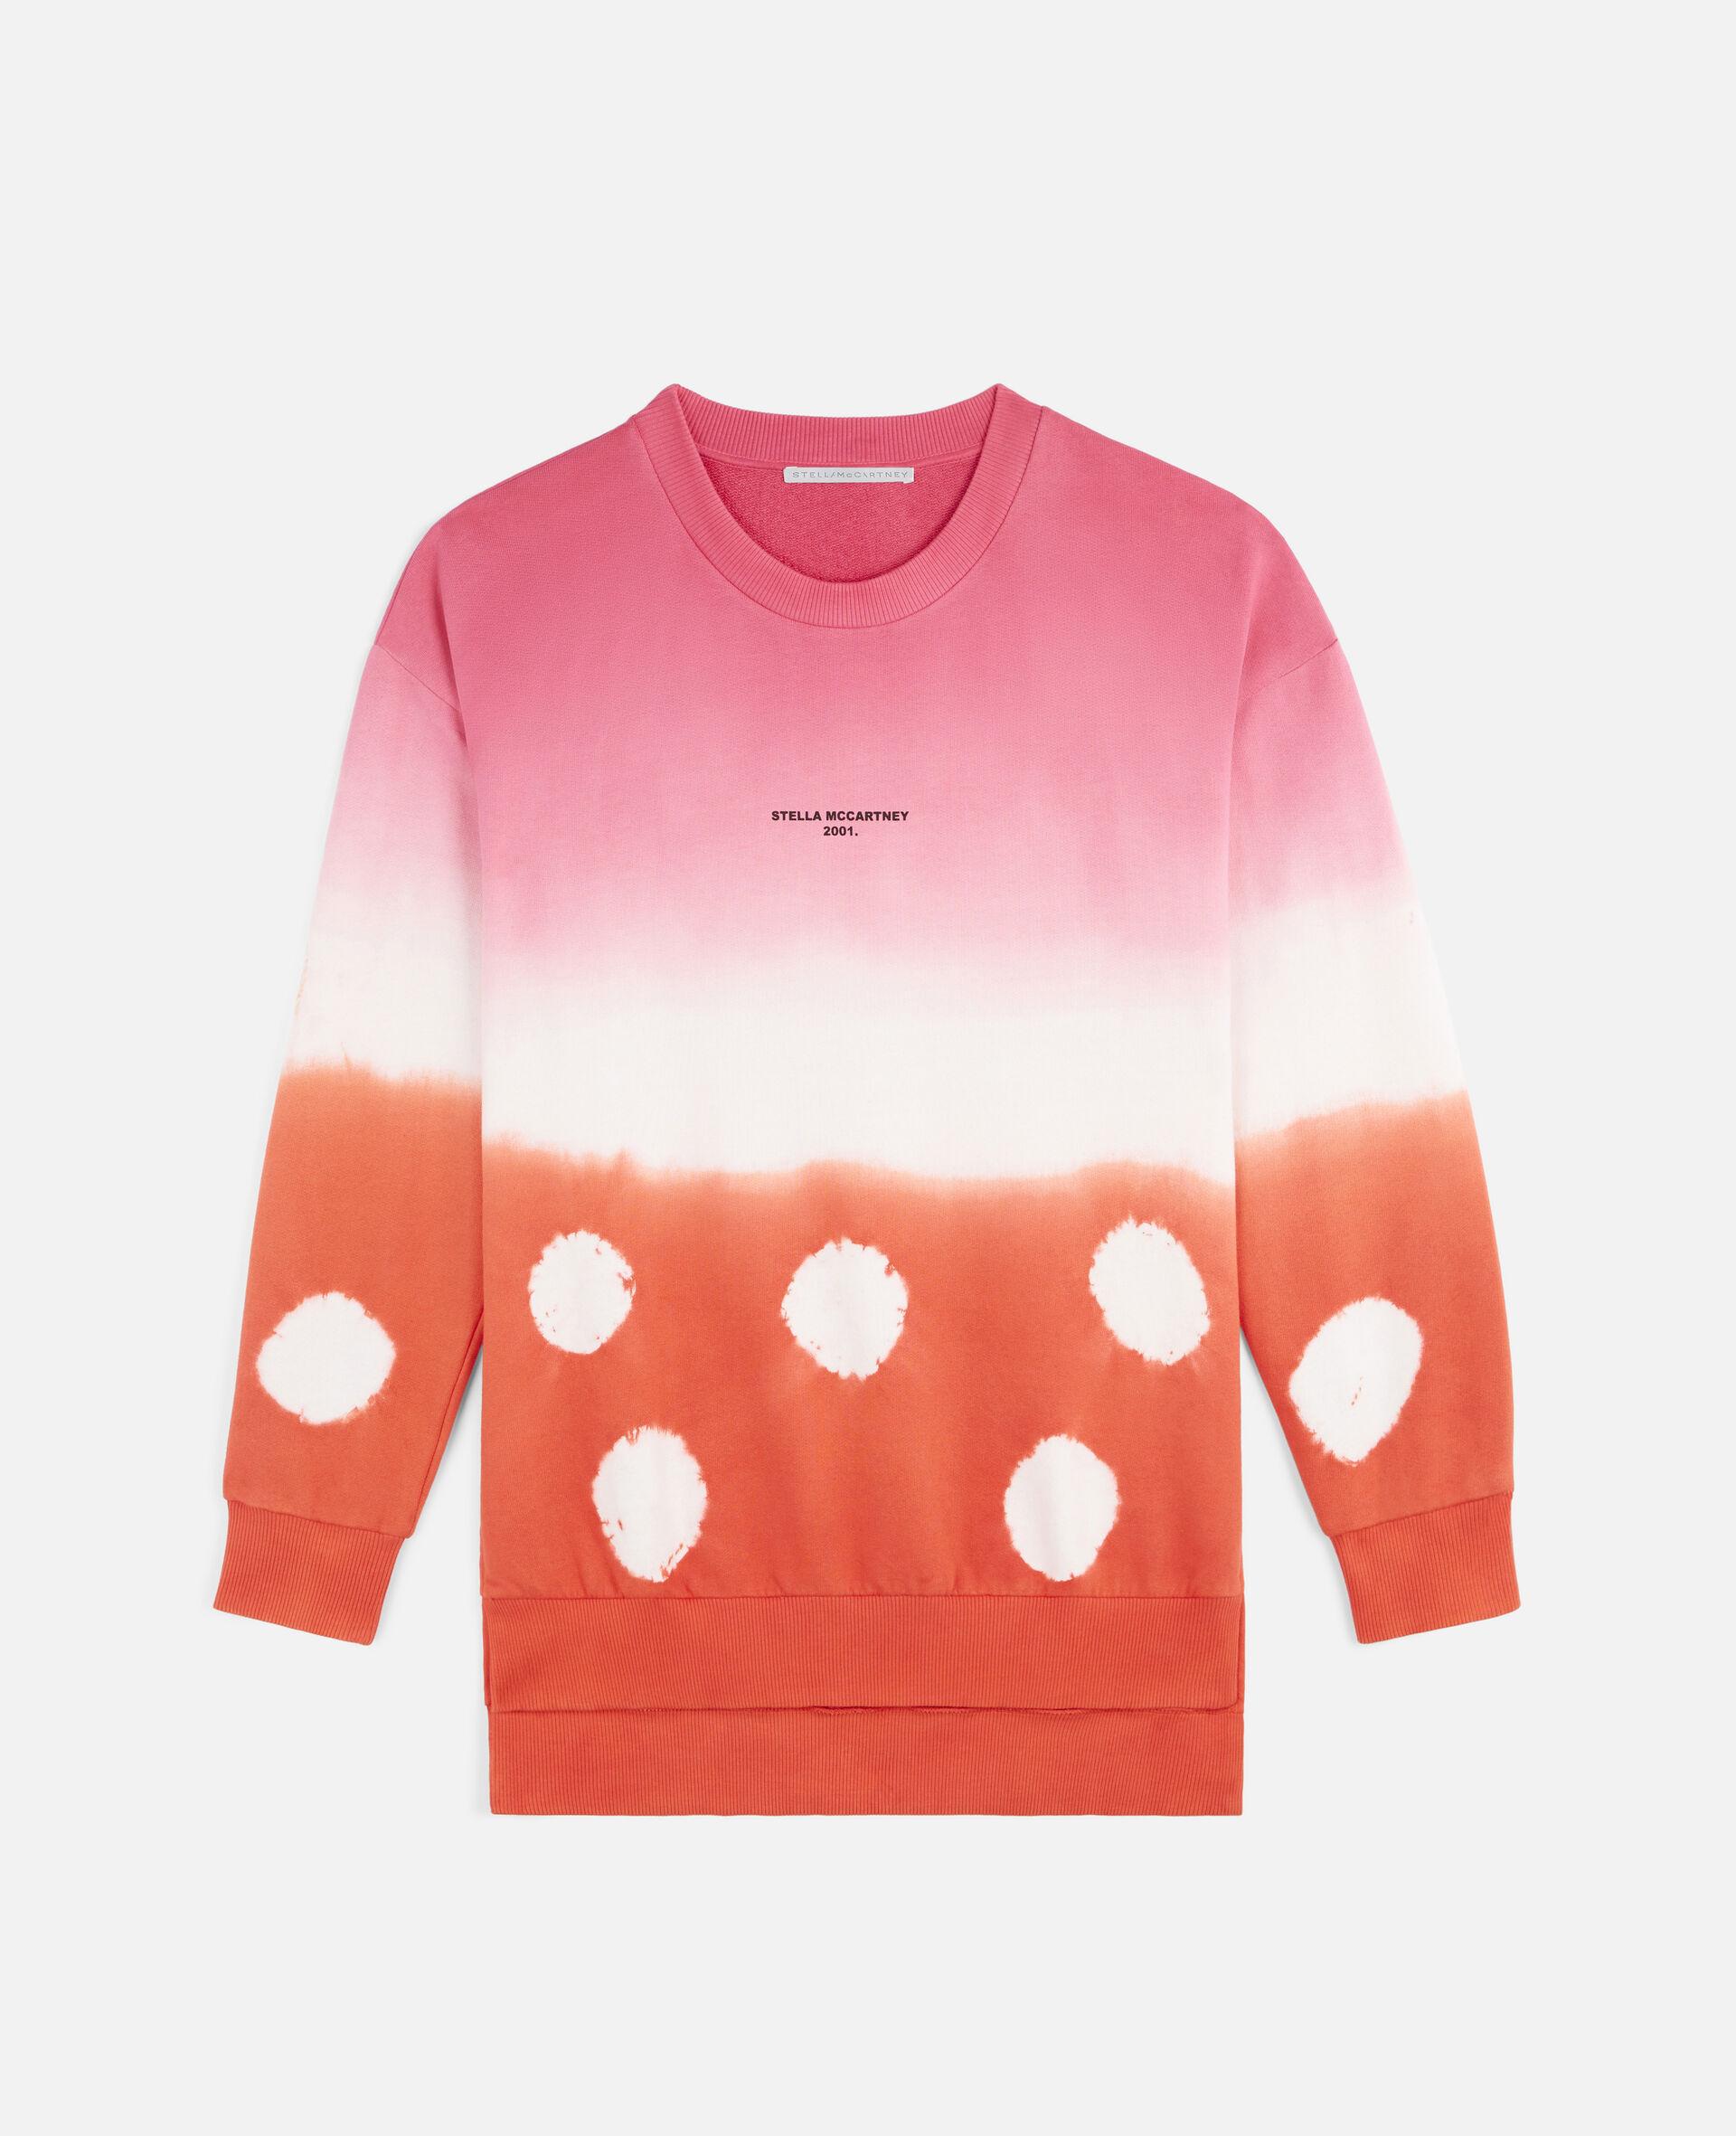 """Stella McCartney 2001."" Sweatshirt im Batik-Style-Bunt-large image number 0"